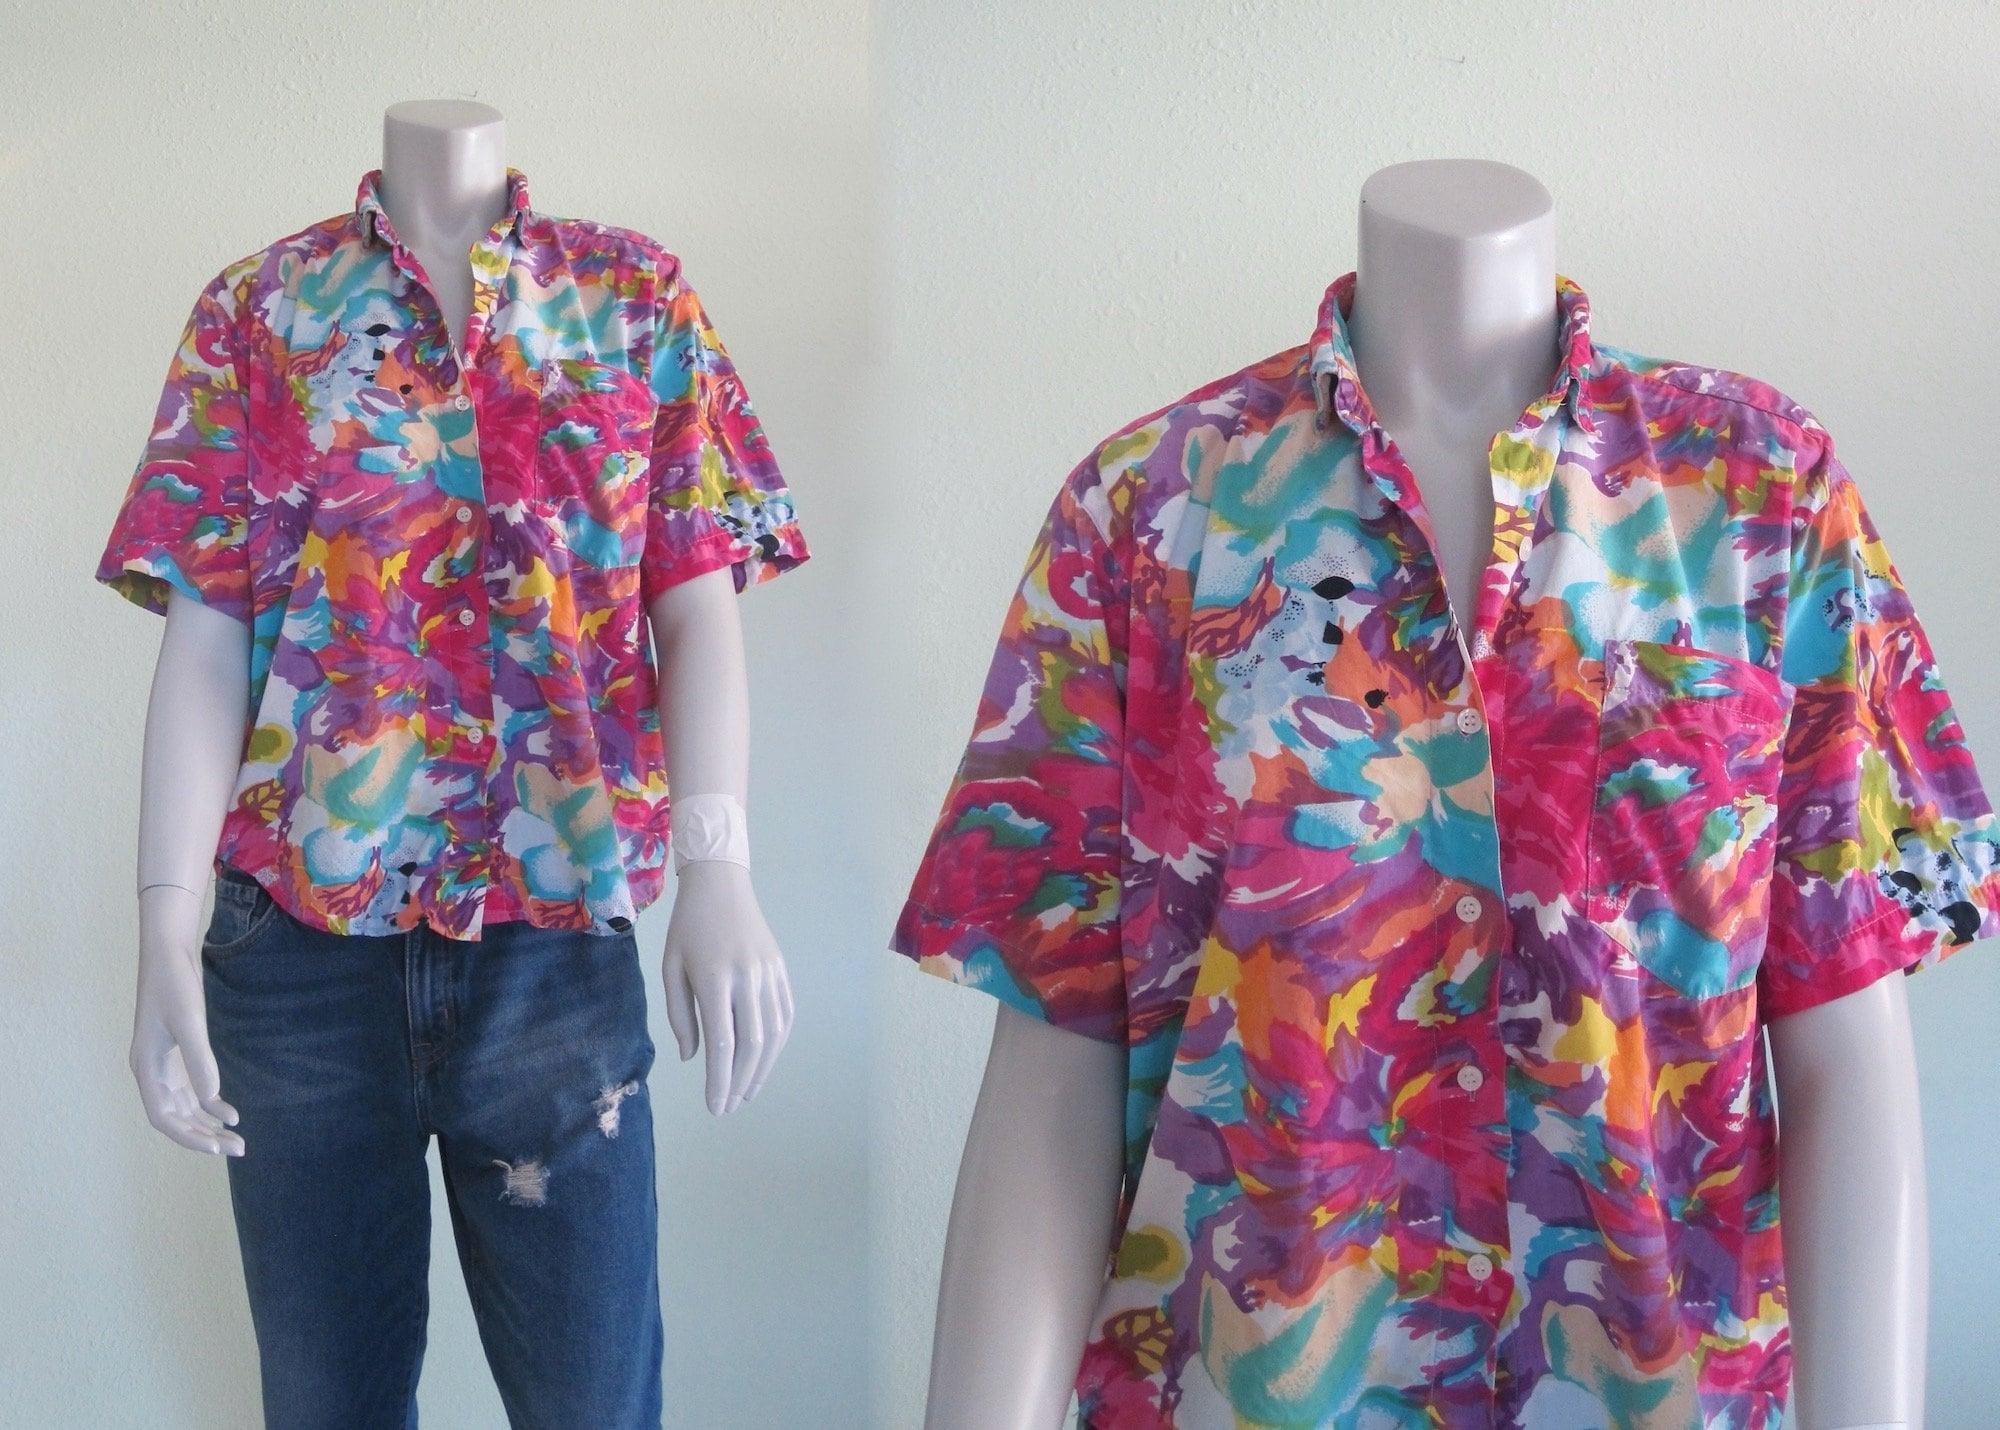 80s Tops, Shirts, T-shirts, Blouse   90s T-shirts 80S Cotton Shirt - Vintage Paint Splatter Print Camp By Andrew Sports 1980S S M $34.00 AT vintagedancer.com